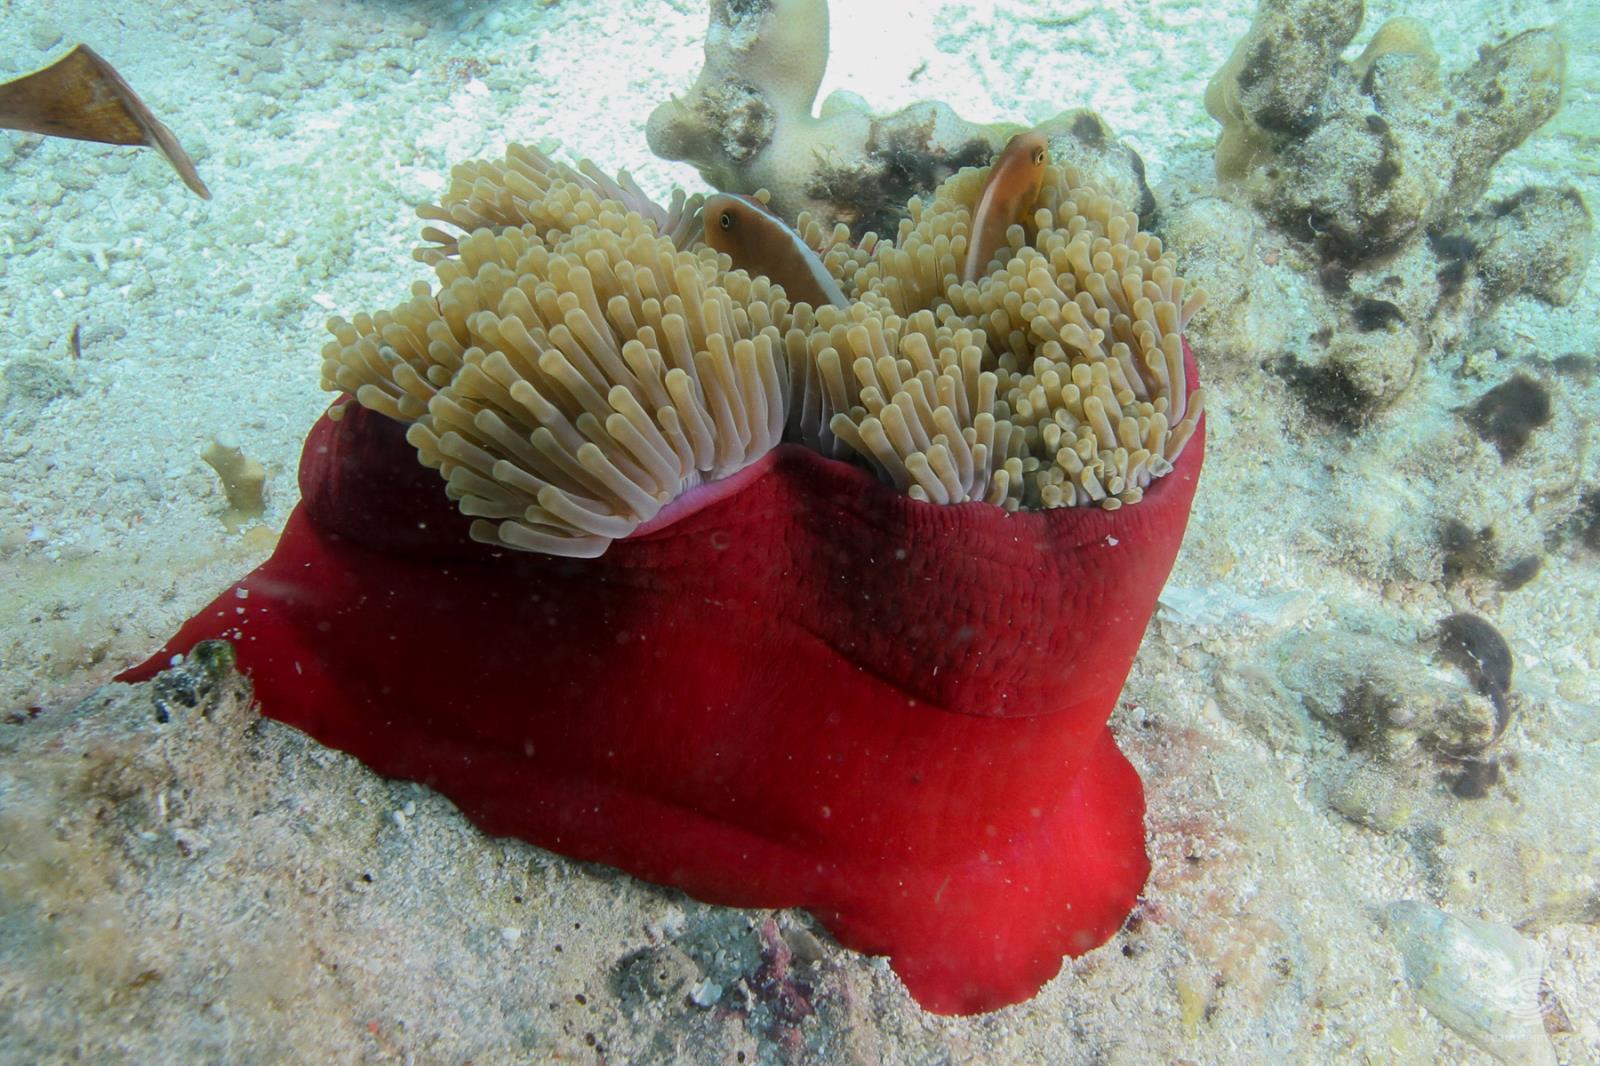 magnificent anemone, Heteractis magnifica Tanzania diving6